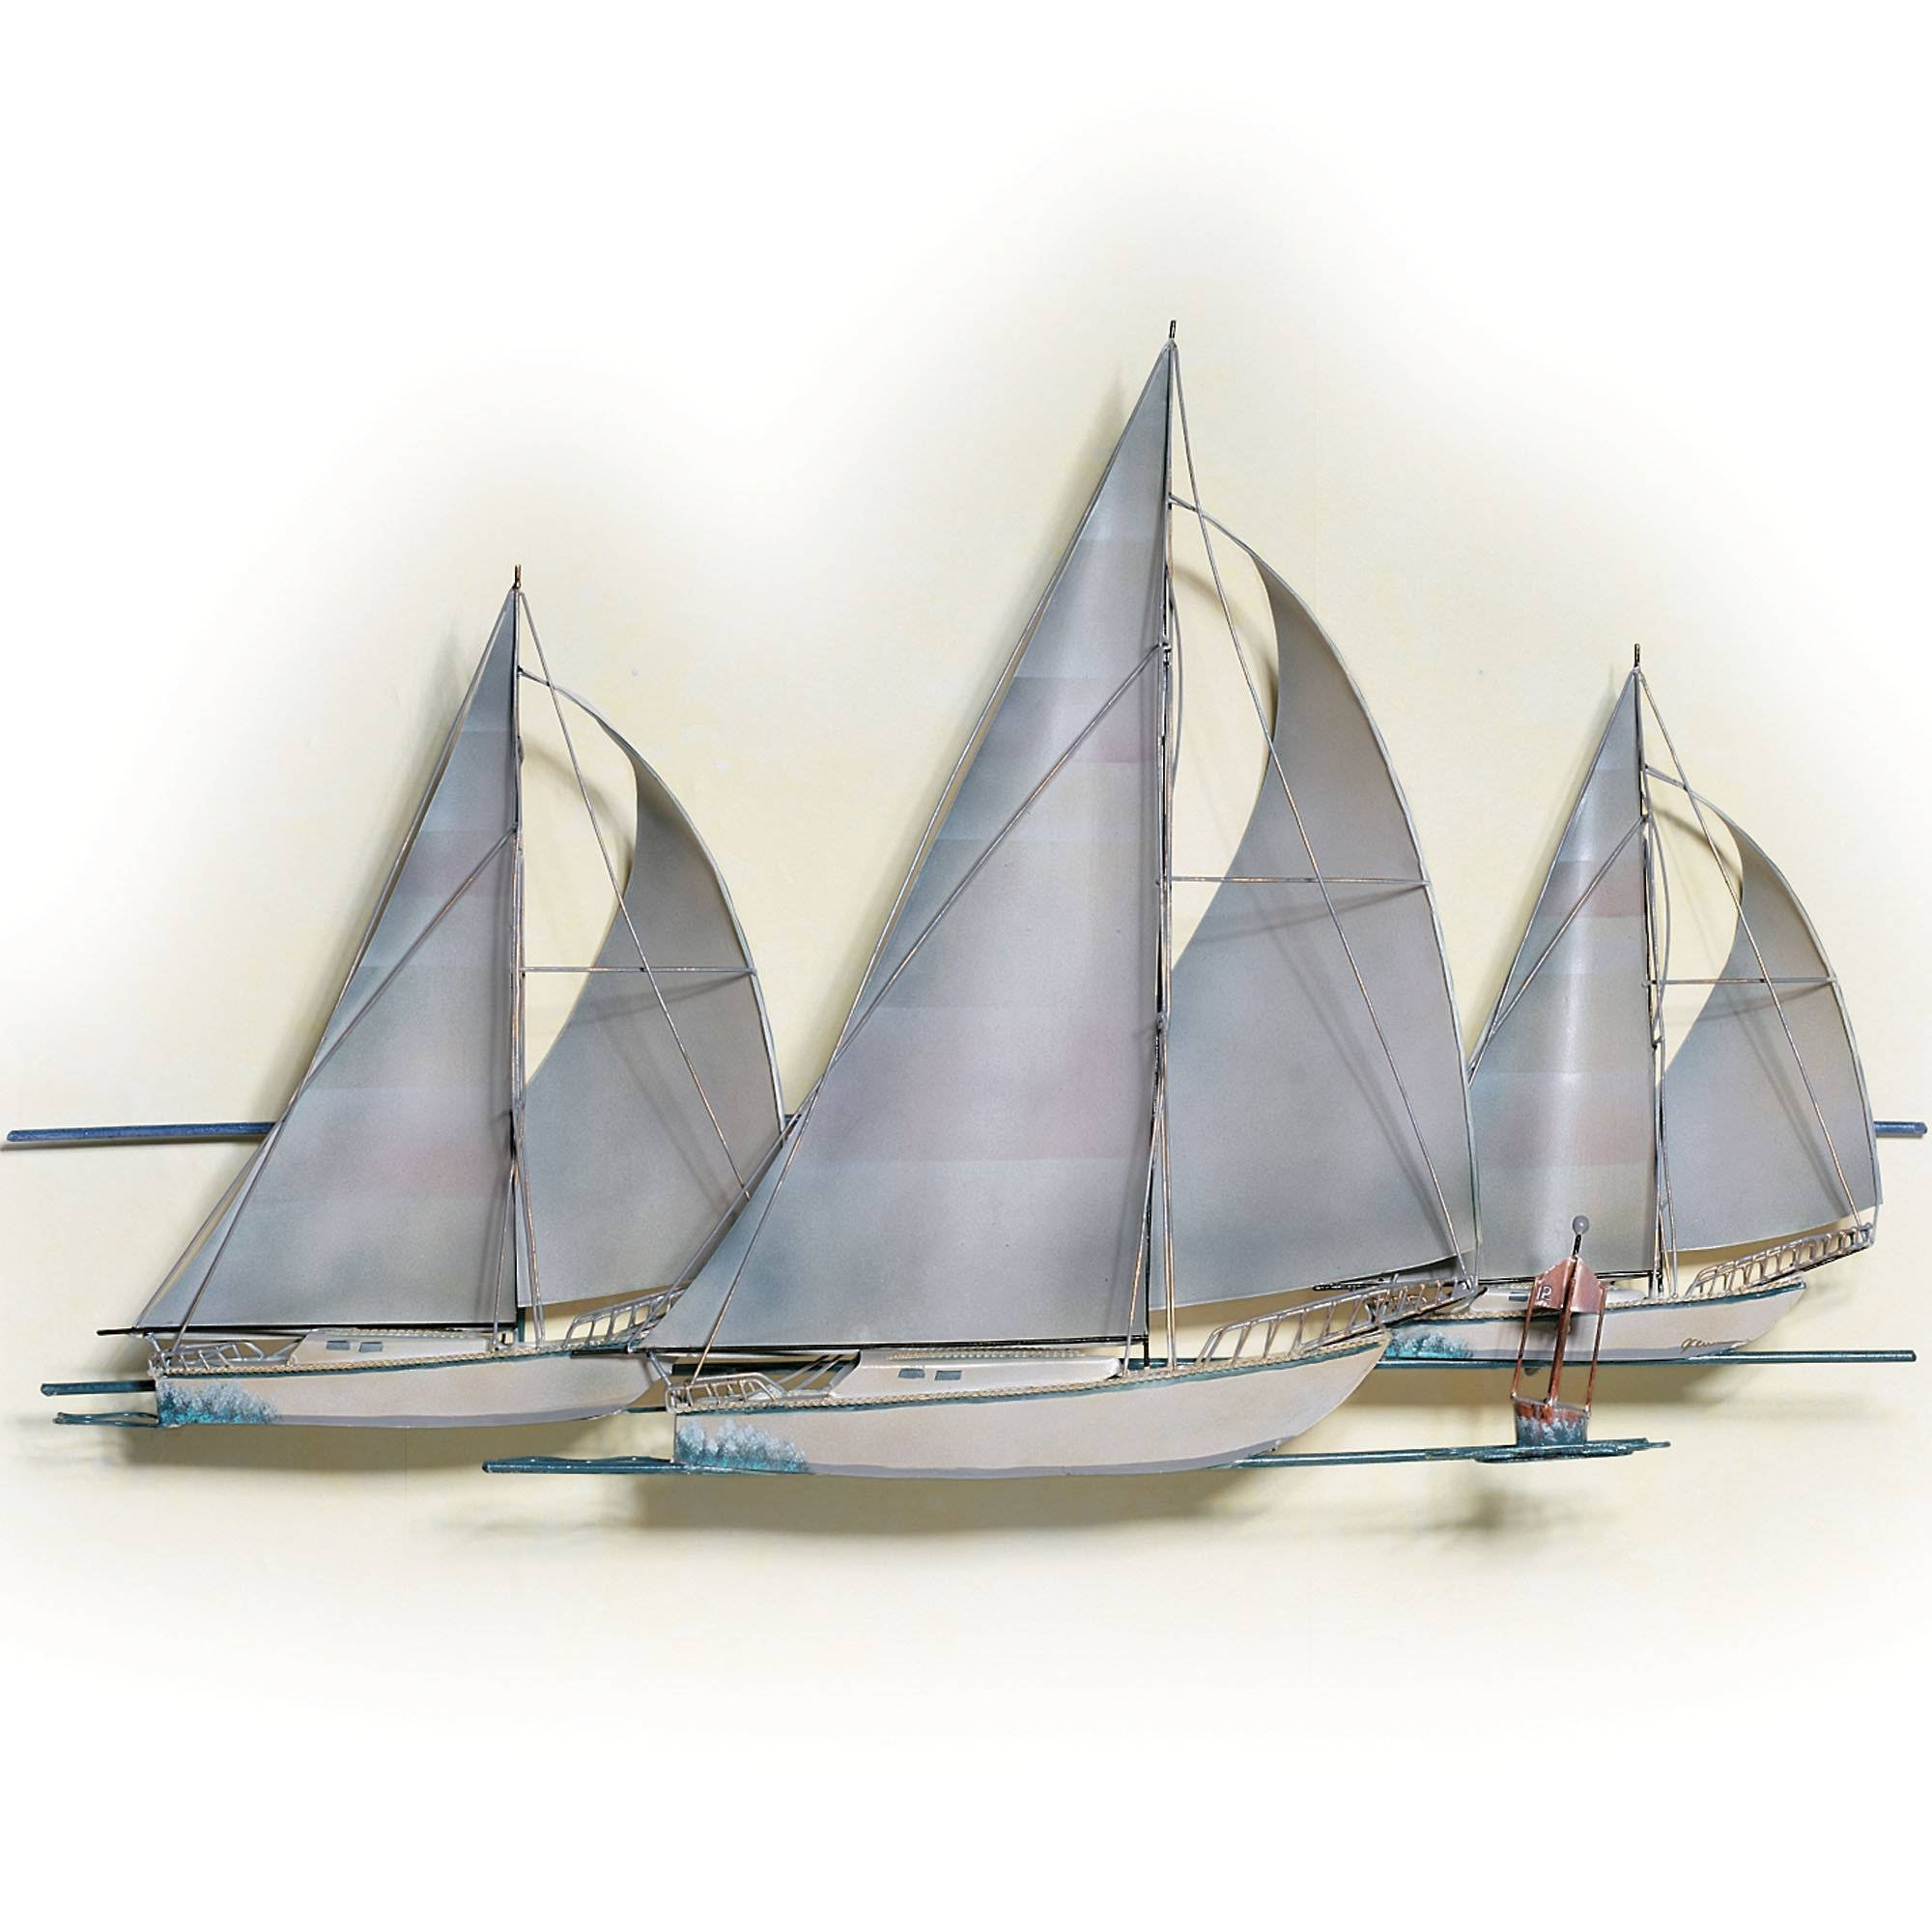 Superb Wall Decor Sailboat Metal Wall Art Metal Sailing Wall Art Pertaining To Latest Boat Wall Art (View 20 of 20)